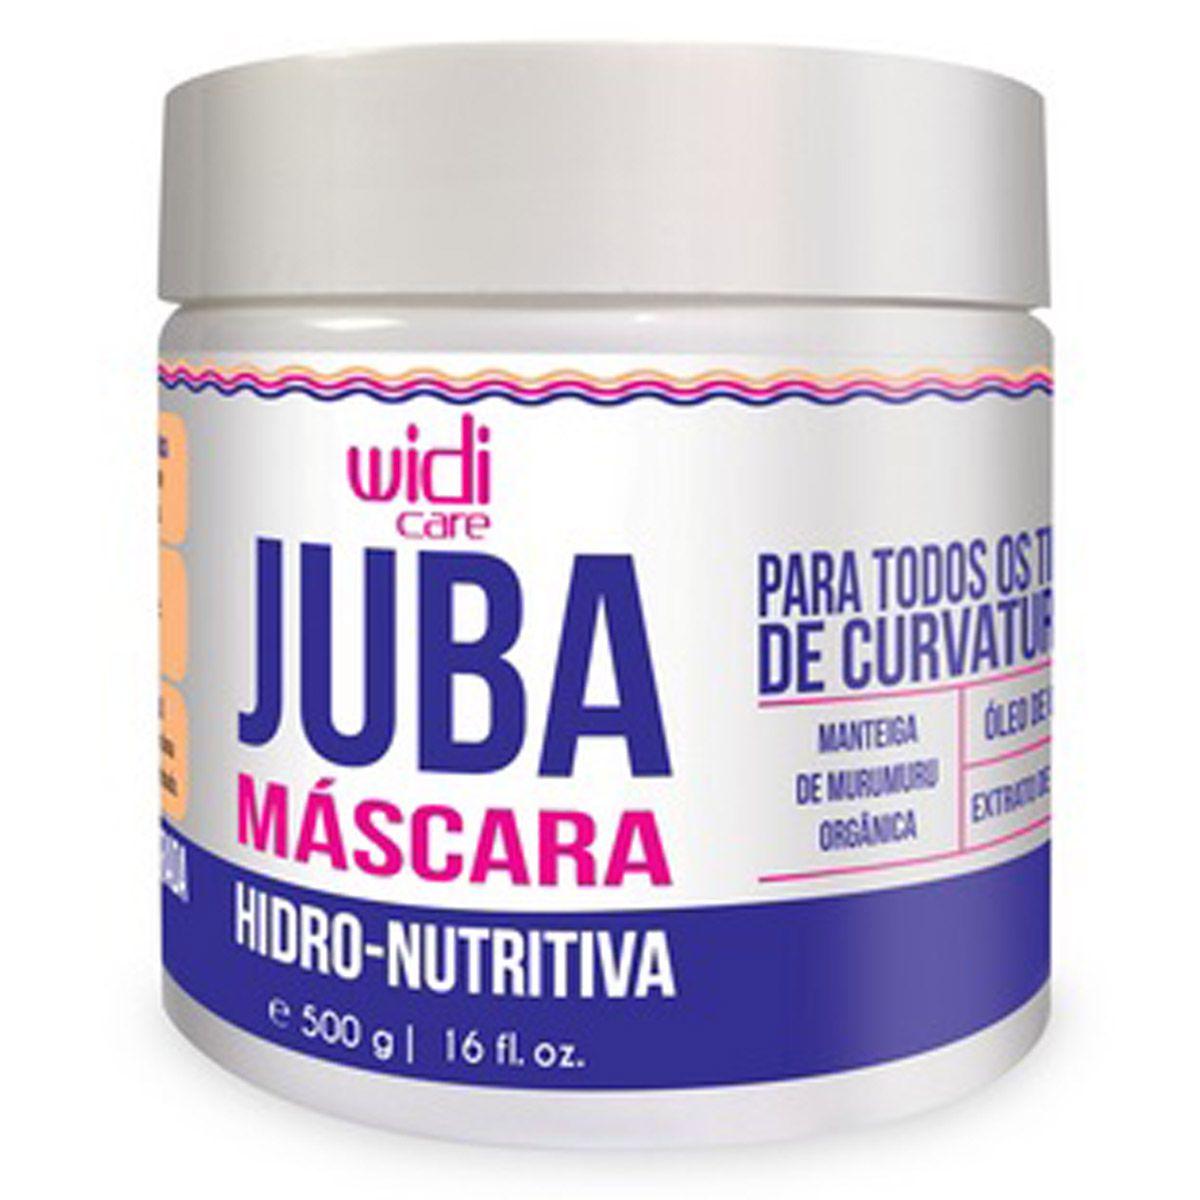 Widi Care - Juba - Máscara Hidro-Nutritiva - 500g